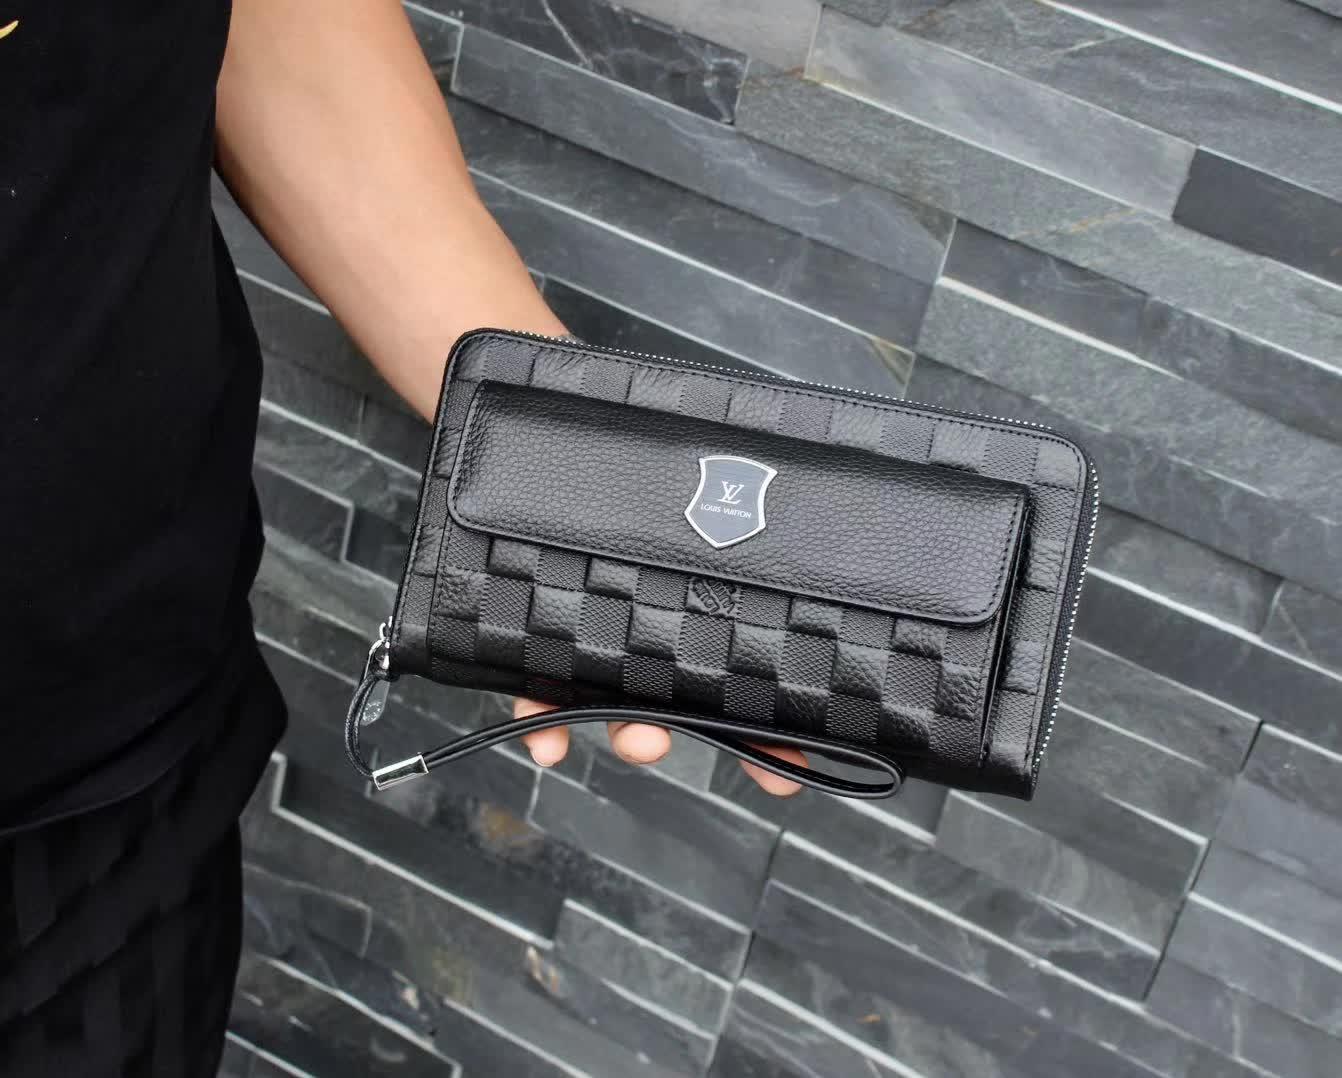 Louis Vuitton ルイヴィトン メンズ 財布 コピー n級国内 632267